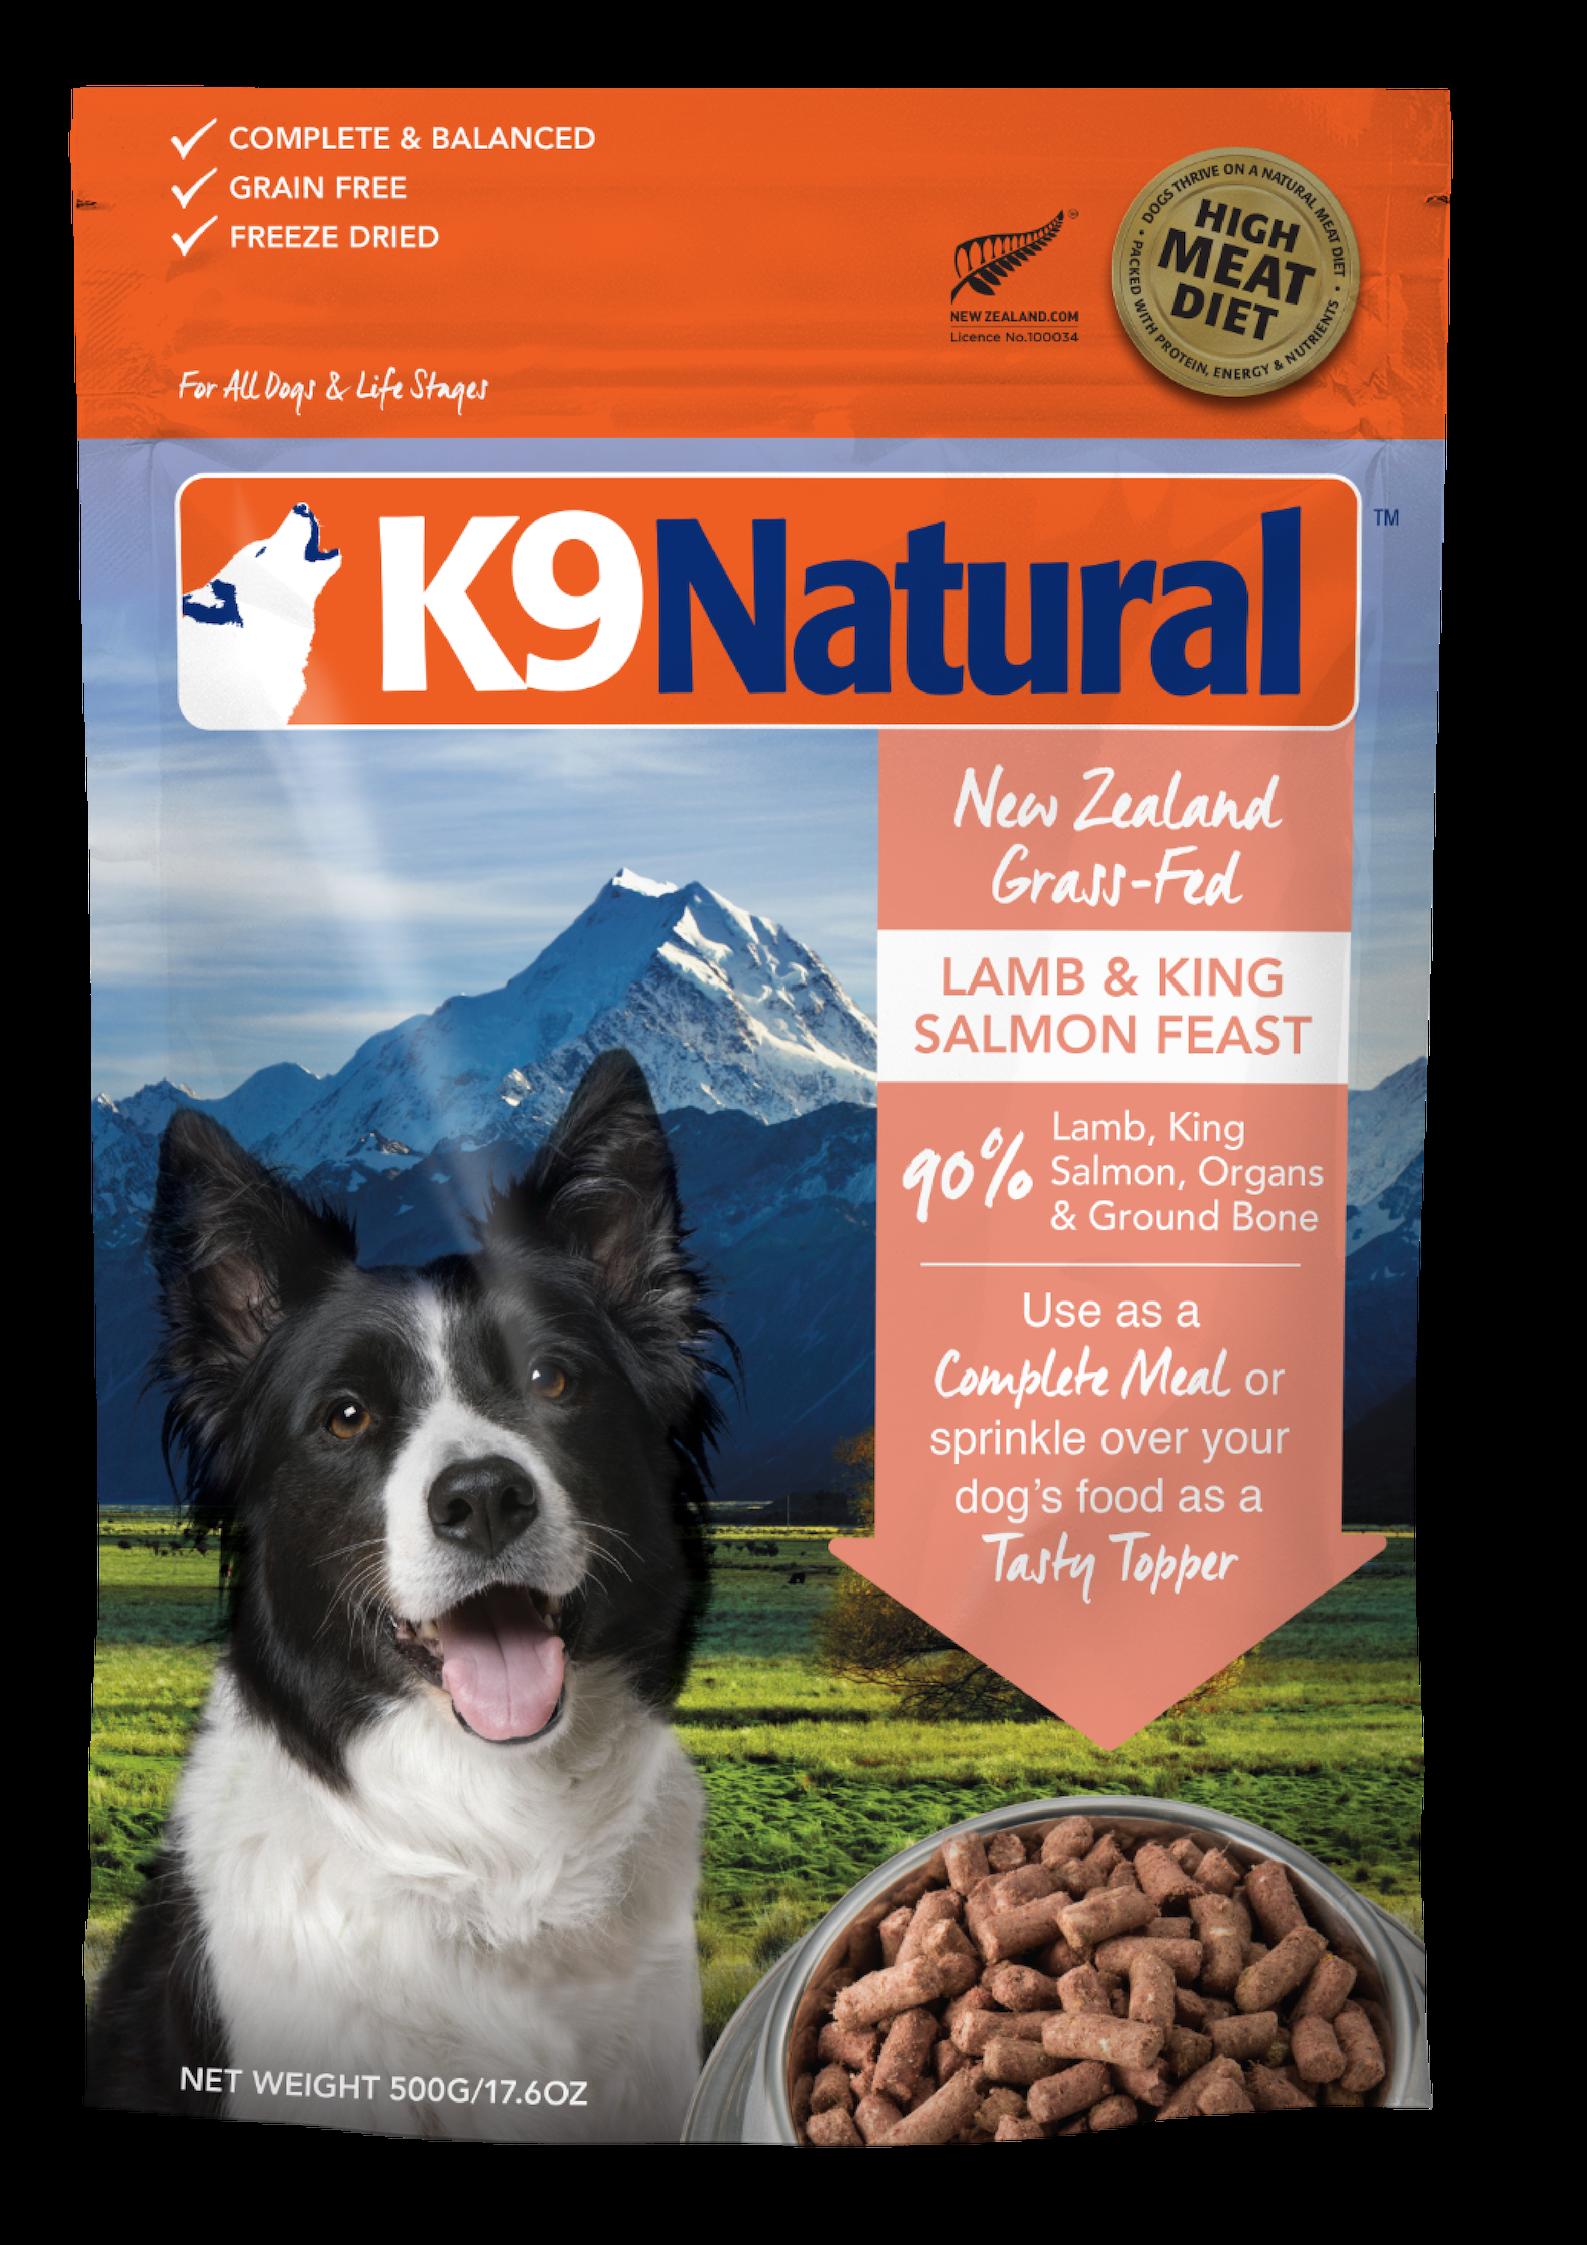 K9 Natural Lamb & Salmon Feast Grain-Free Freeze-Dried Dog Food, 1.1-lb